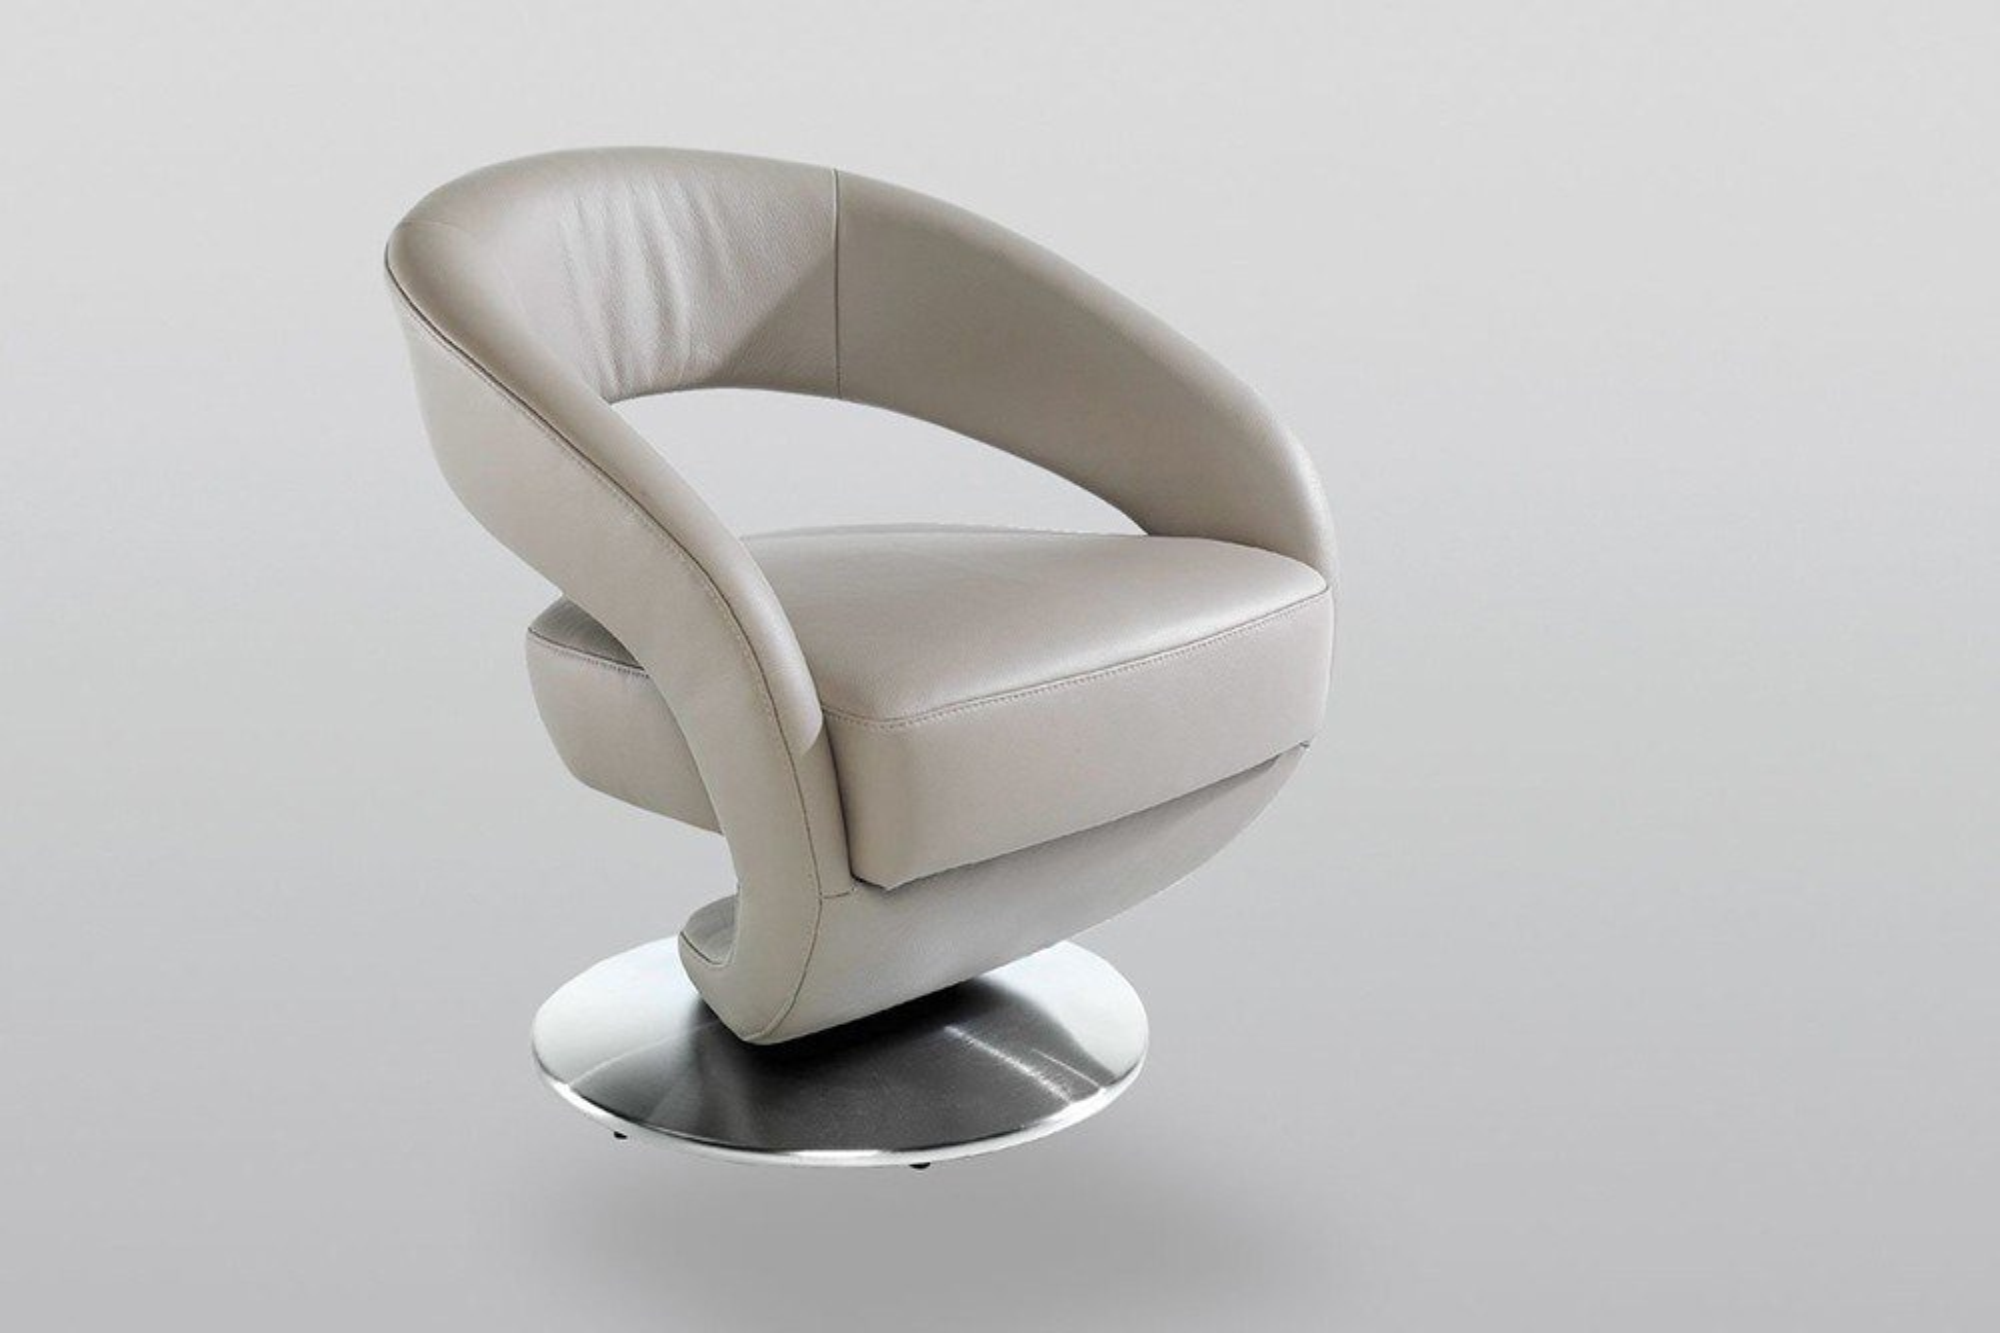 K+W Polstermöbel Kenzo Sessel grau   Möbel Letz - Ihr Online-Shop